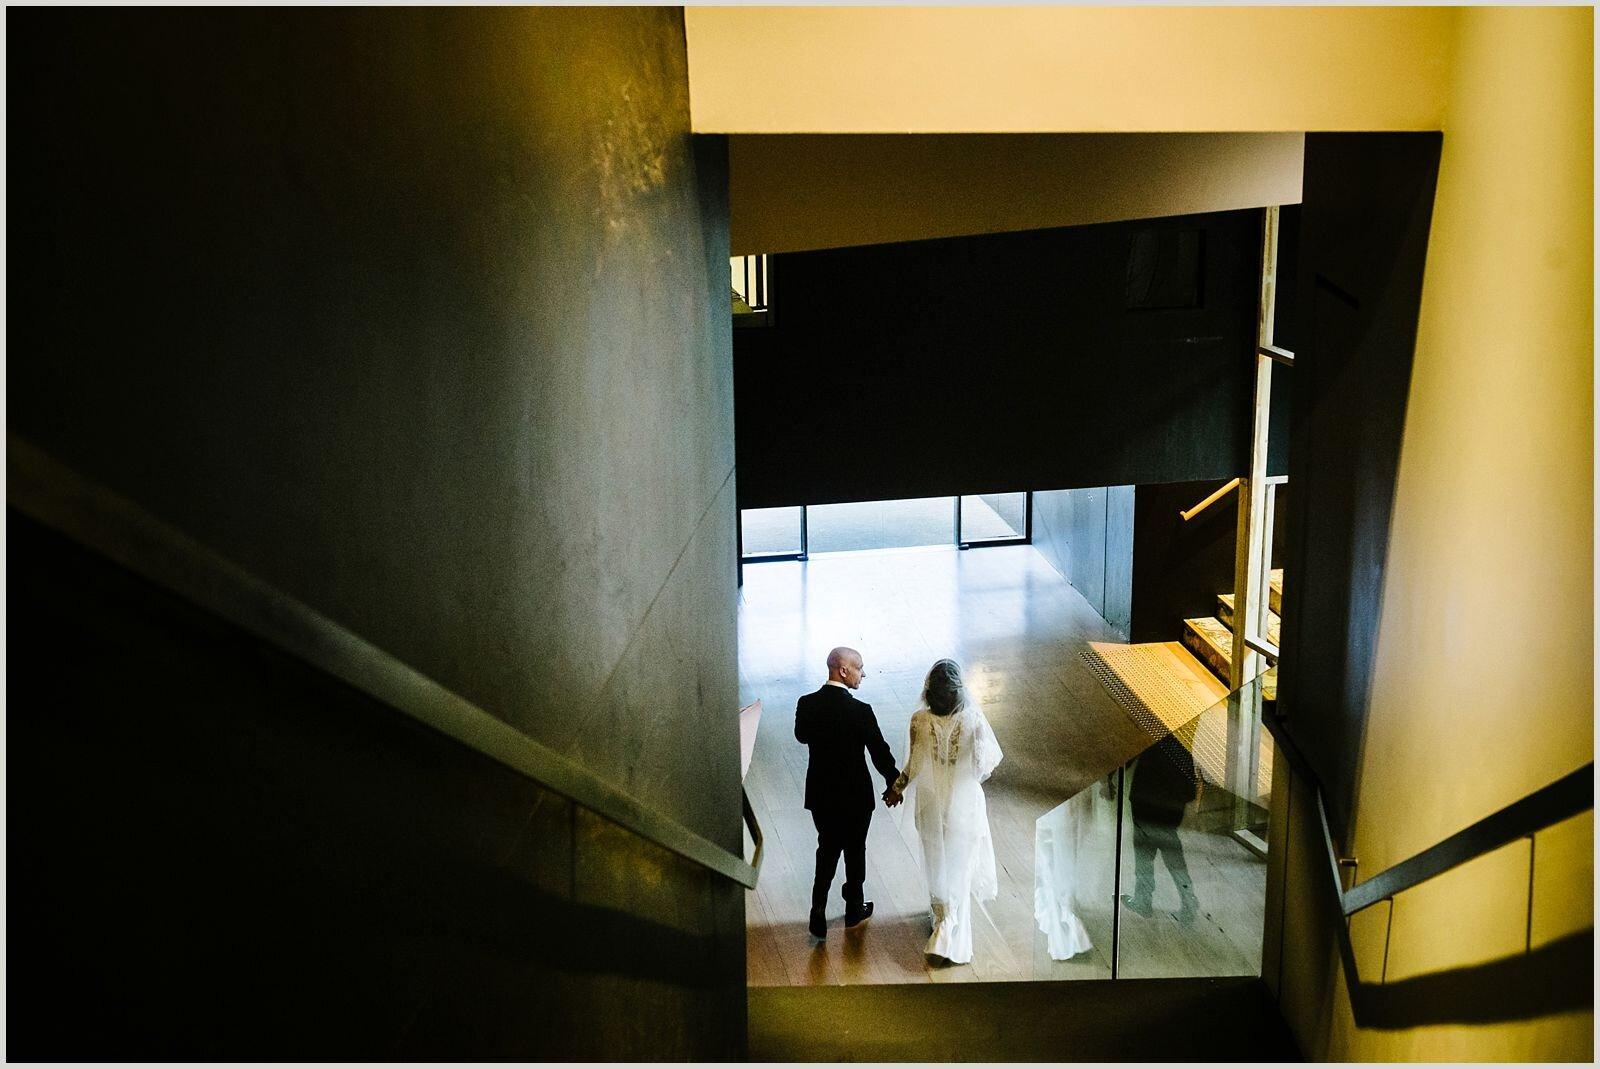 joseph_koprek_wedding_melbourne_the_prince_deck_0023.jpg